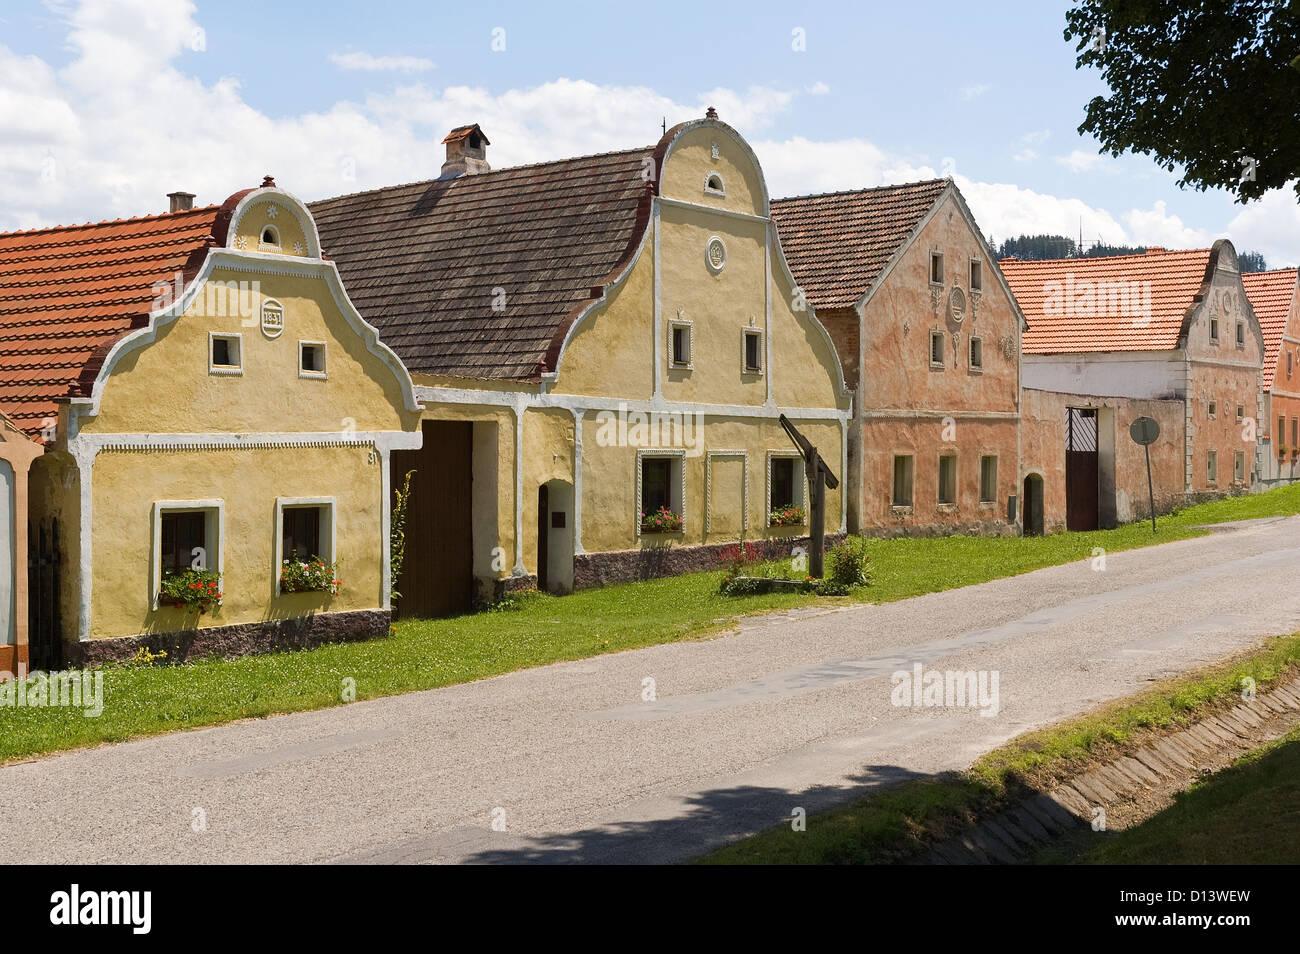 Elk188-2881 Czech Republic, Holasovice, folk baroque painted farmhouses - Stock Image